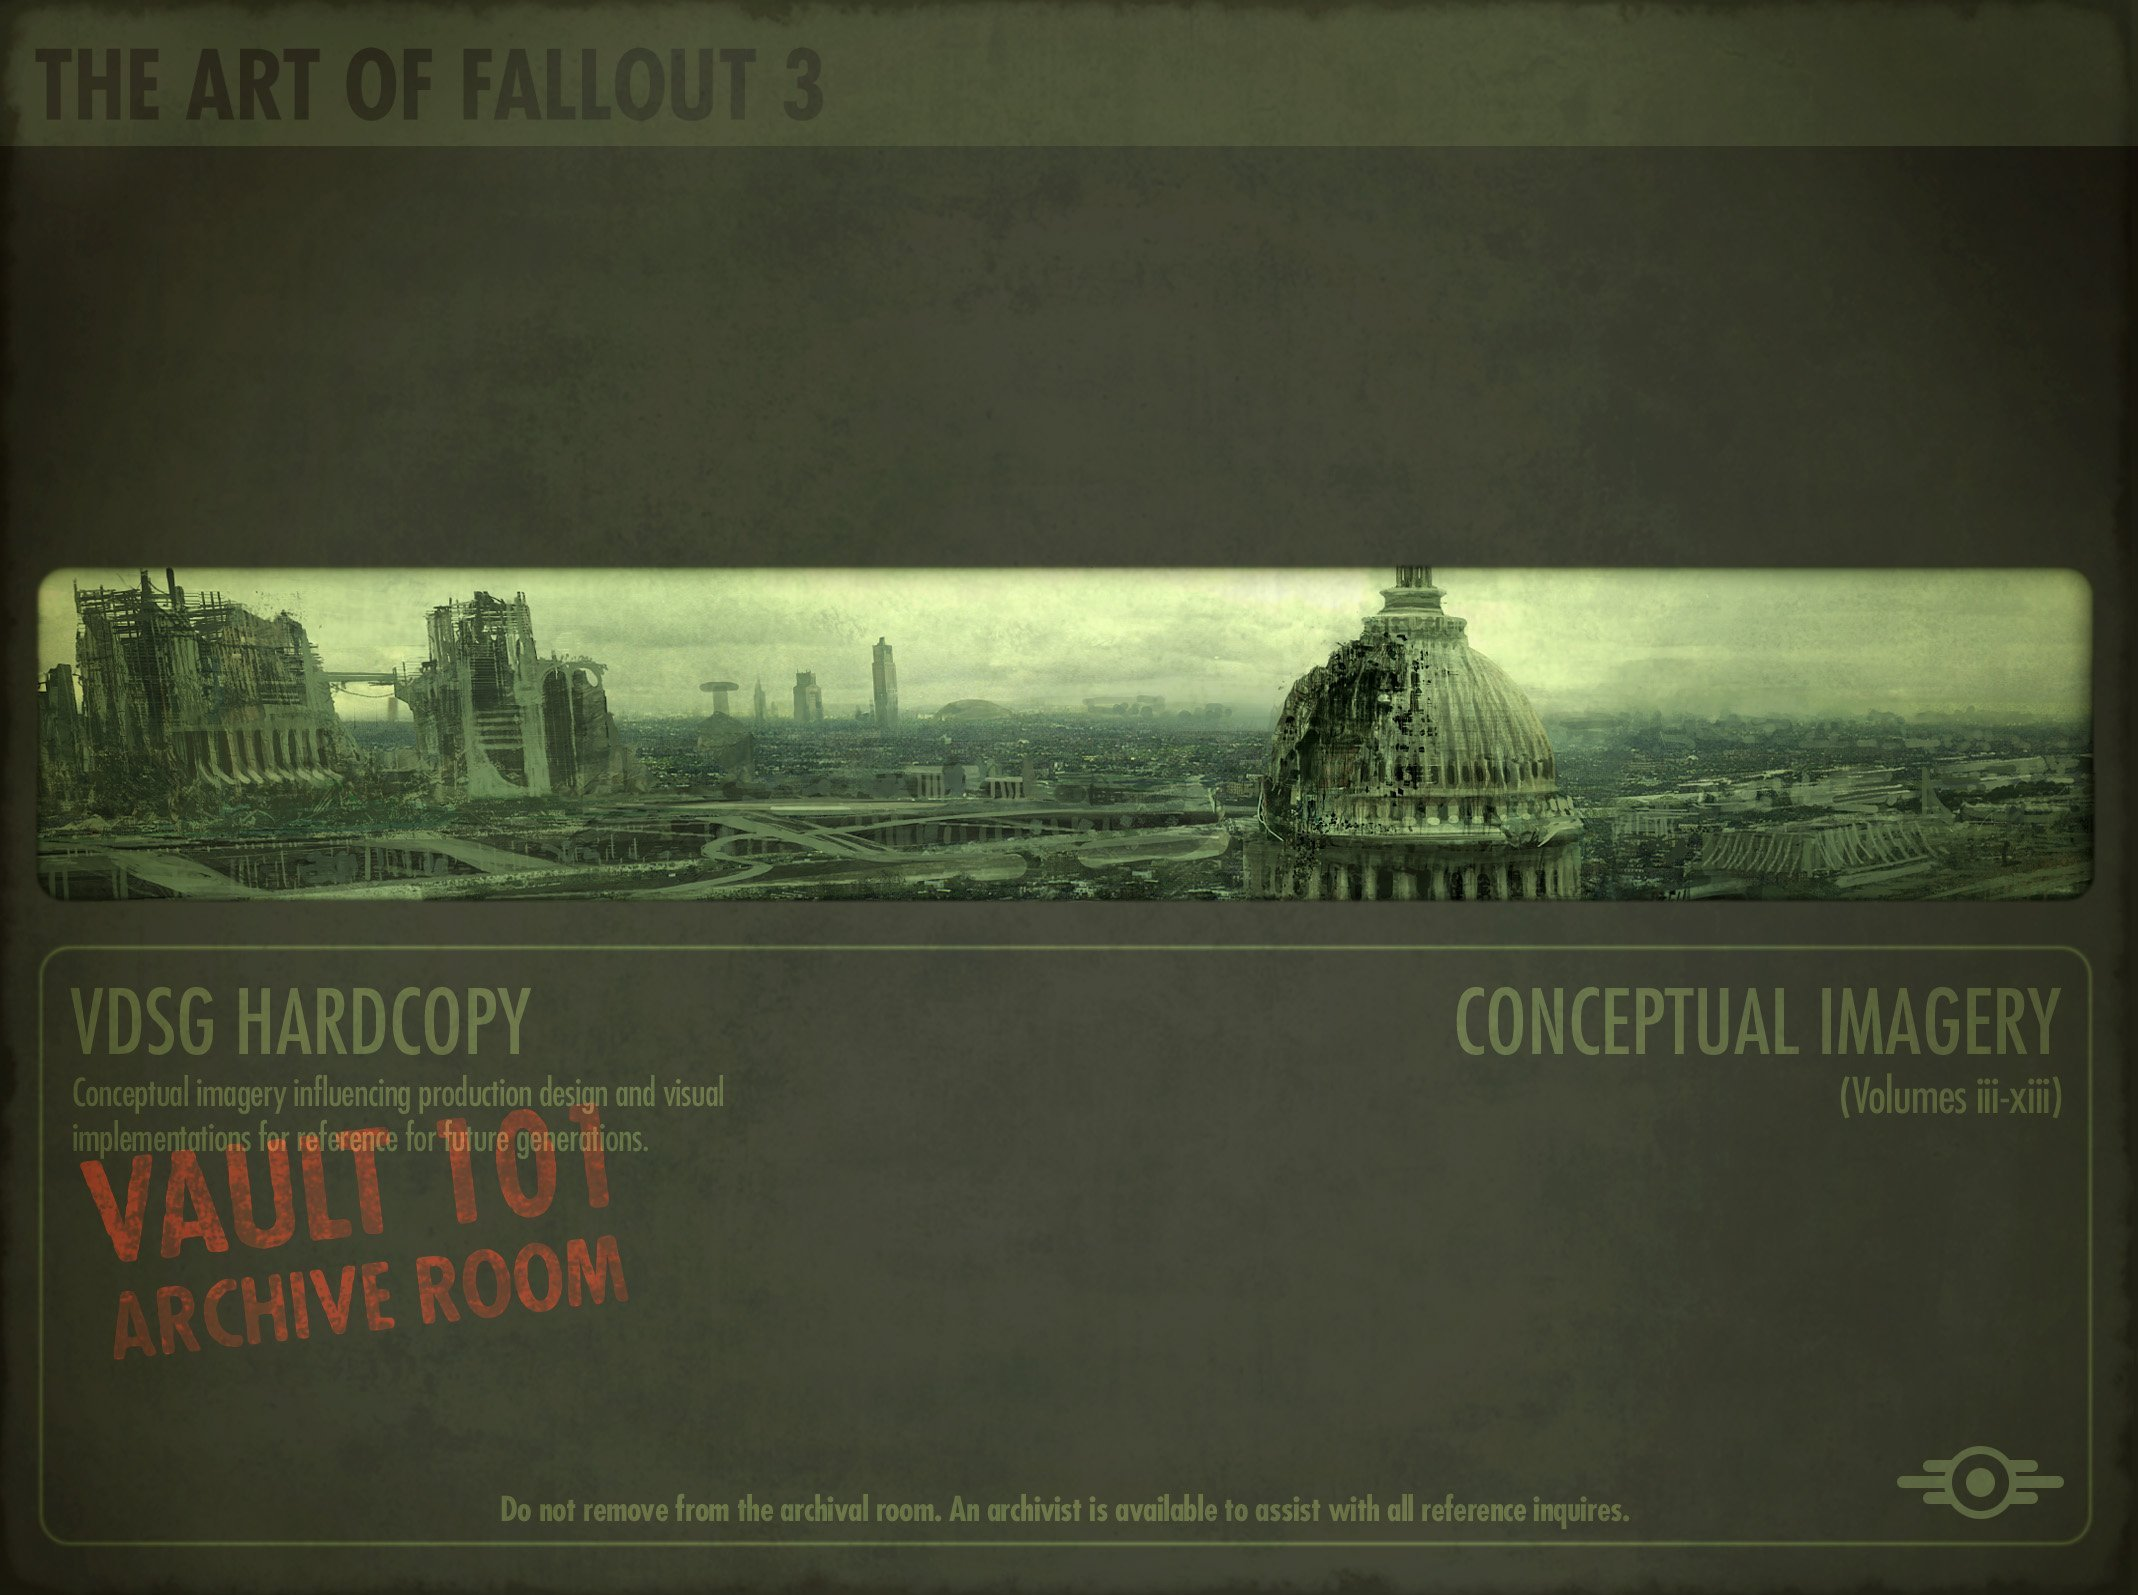 Fallout - The Art of Fallout 3